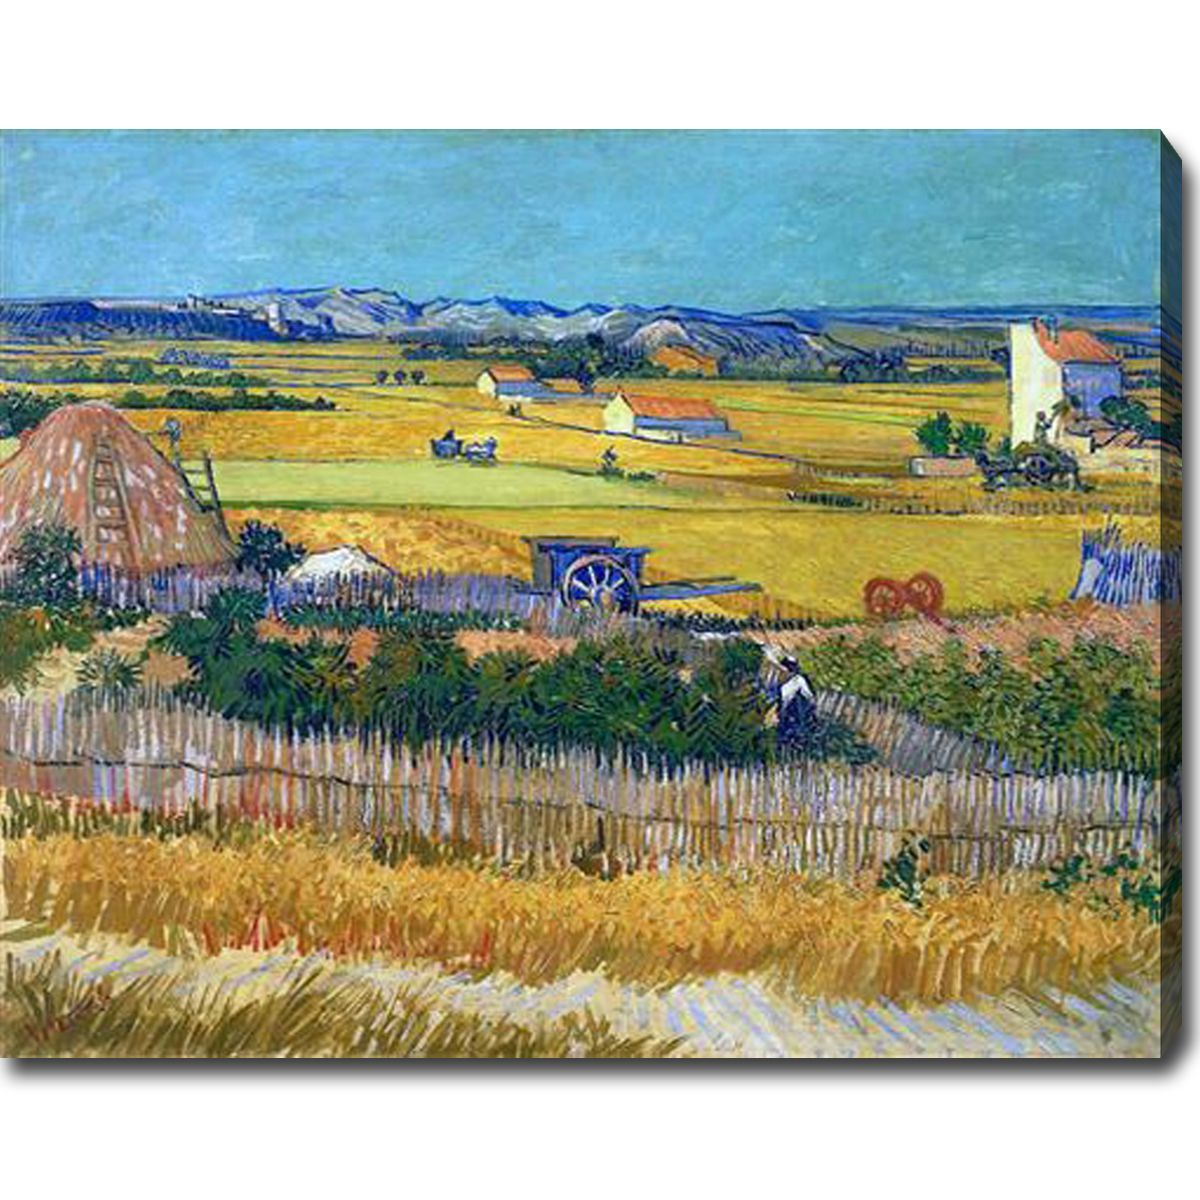 Vincent Van Gogh ' Harvest' Oil Canvas Art - Multi